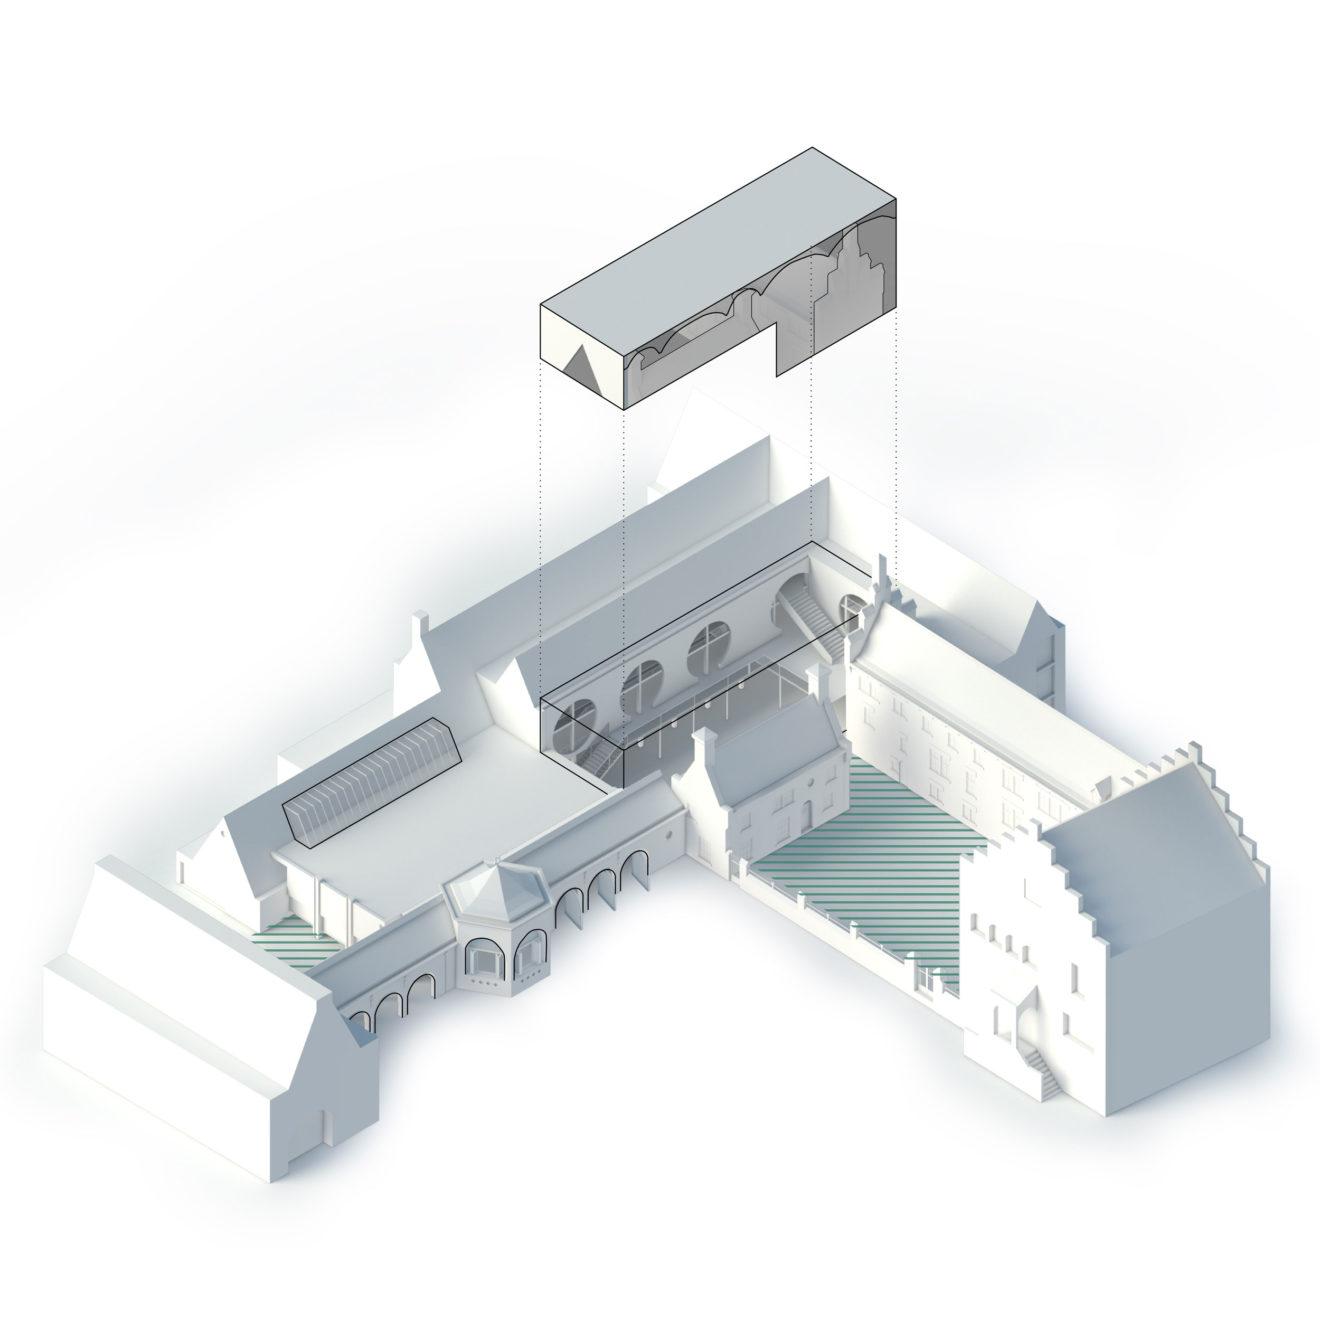 04-Civic-Architects-Schoenenmuseum-Waalwijk-Interieur-Copyright-Civic-Architects